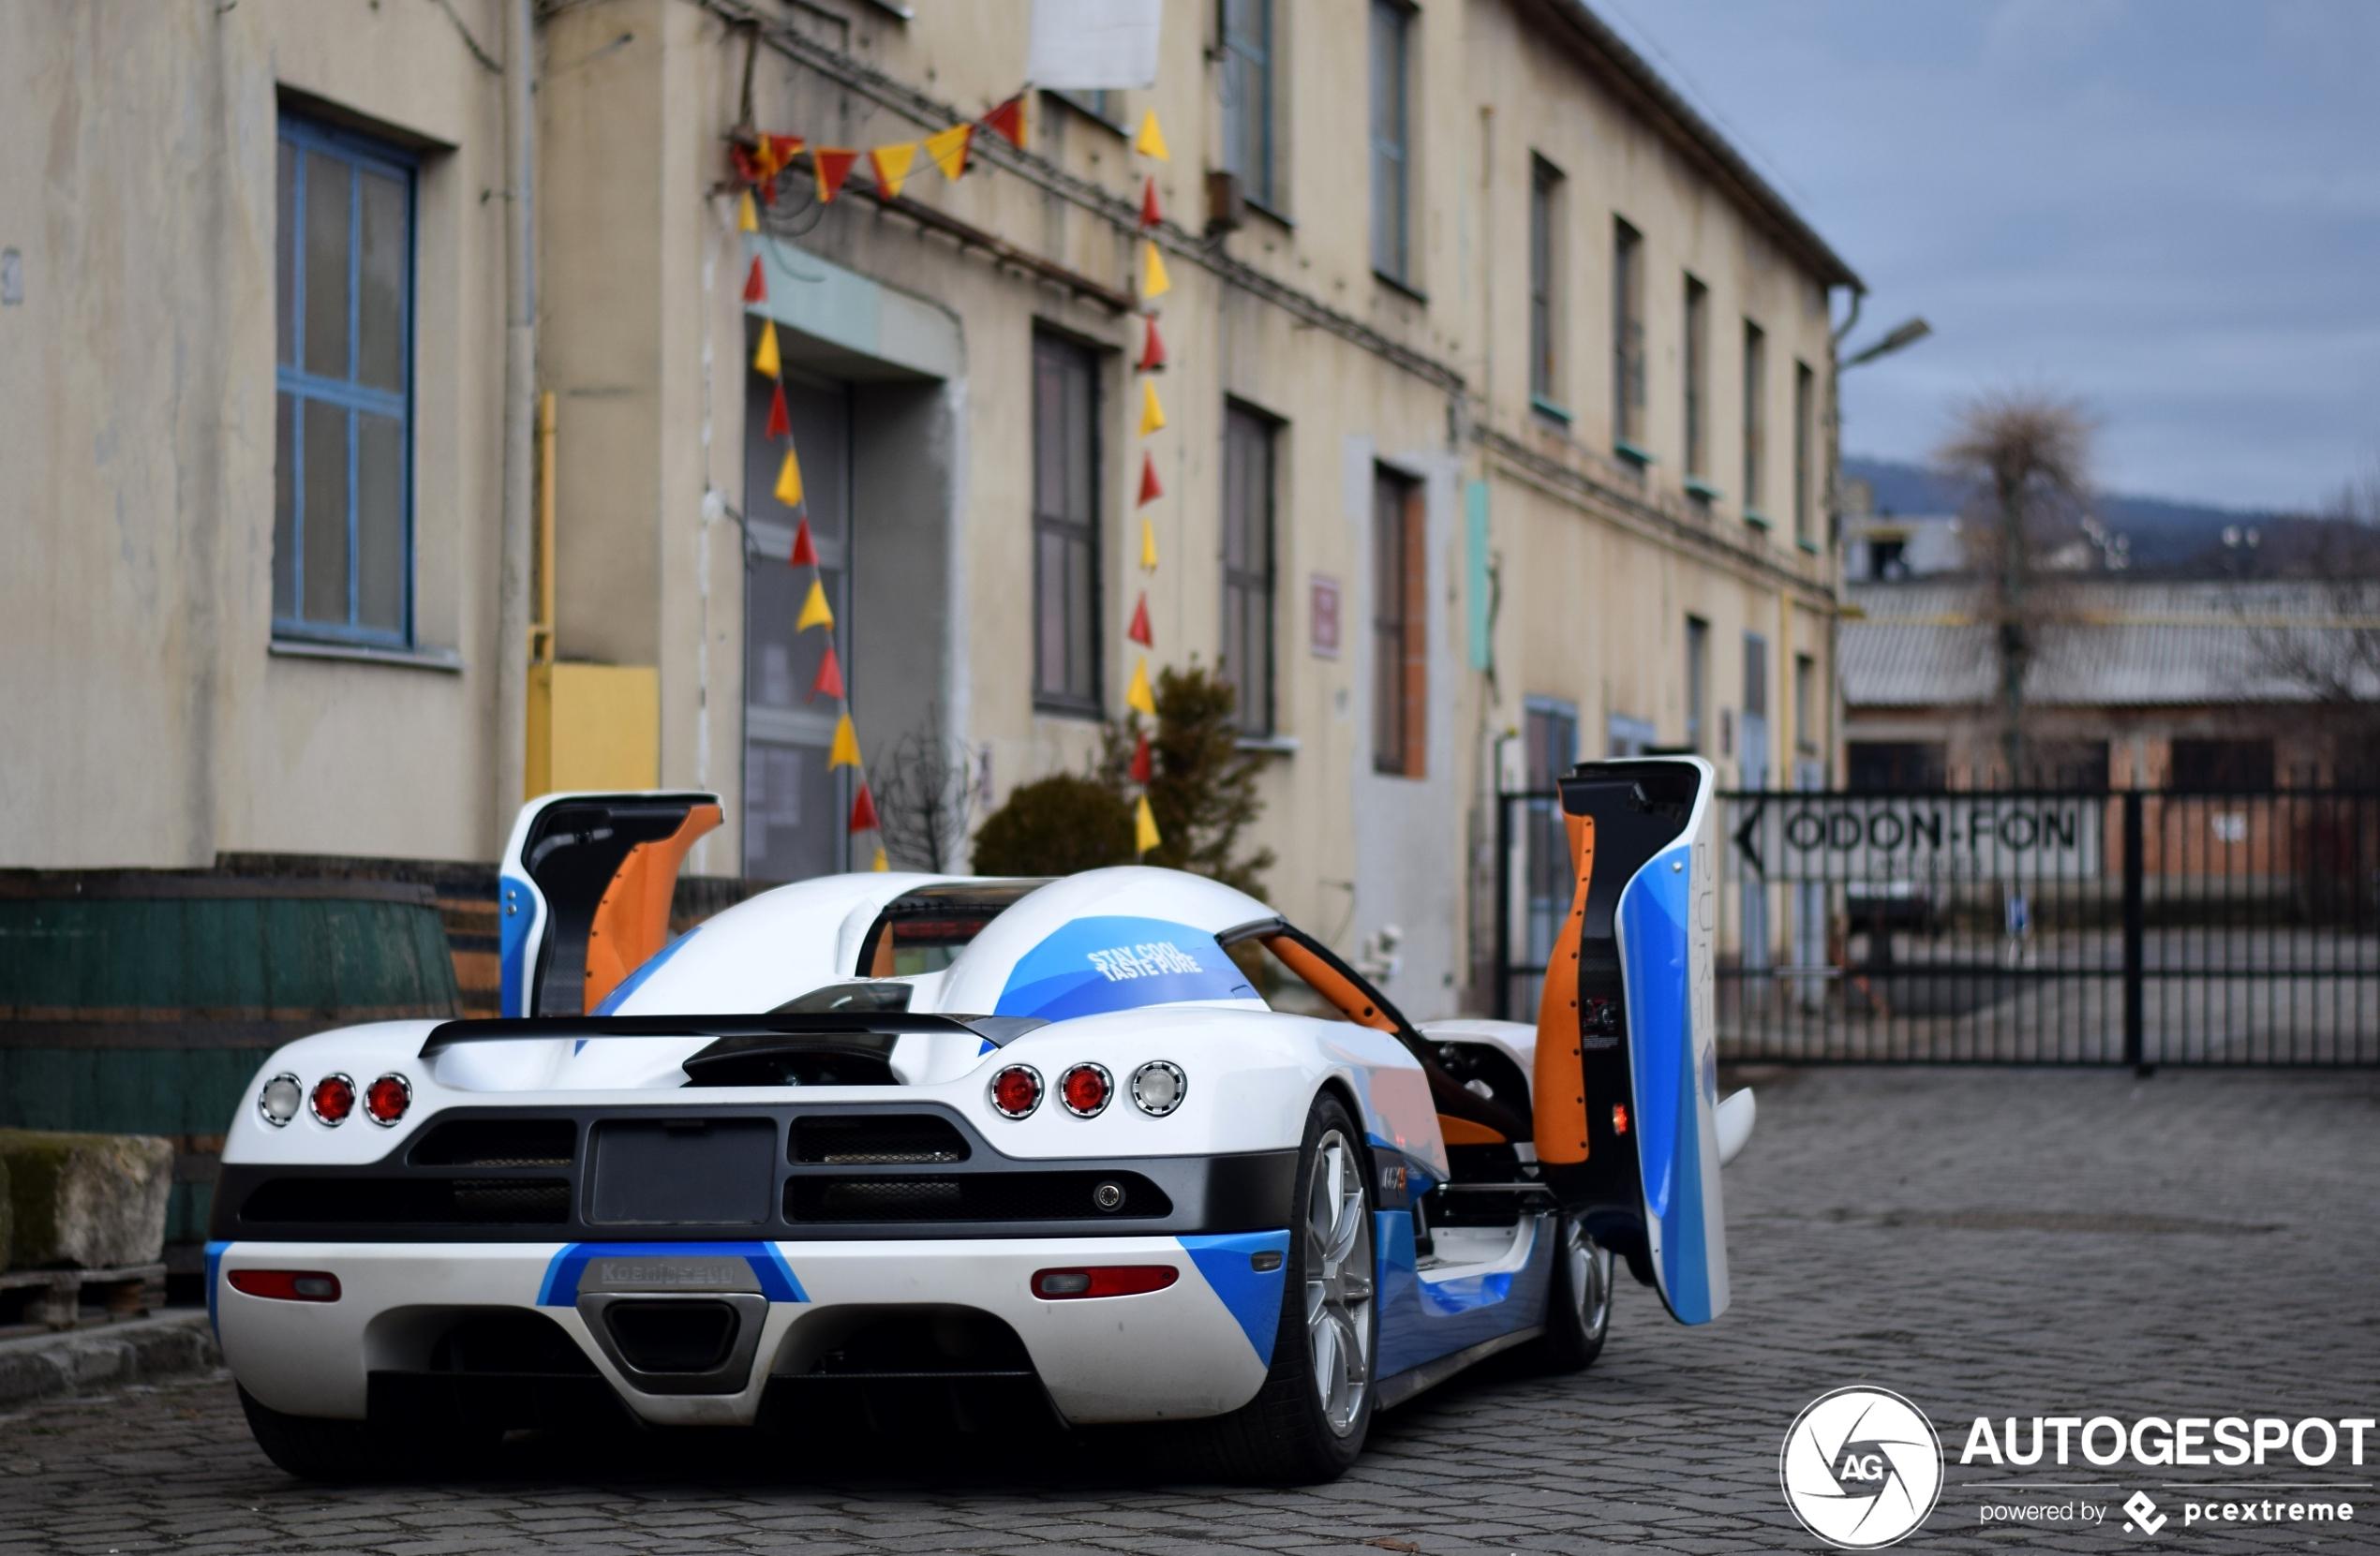 Koenigsegg CCXS pakt de aandacht